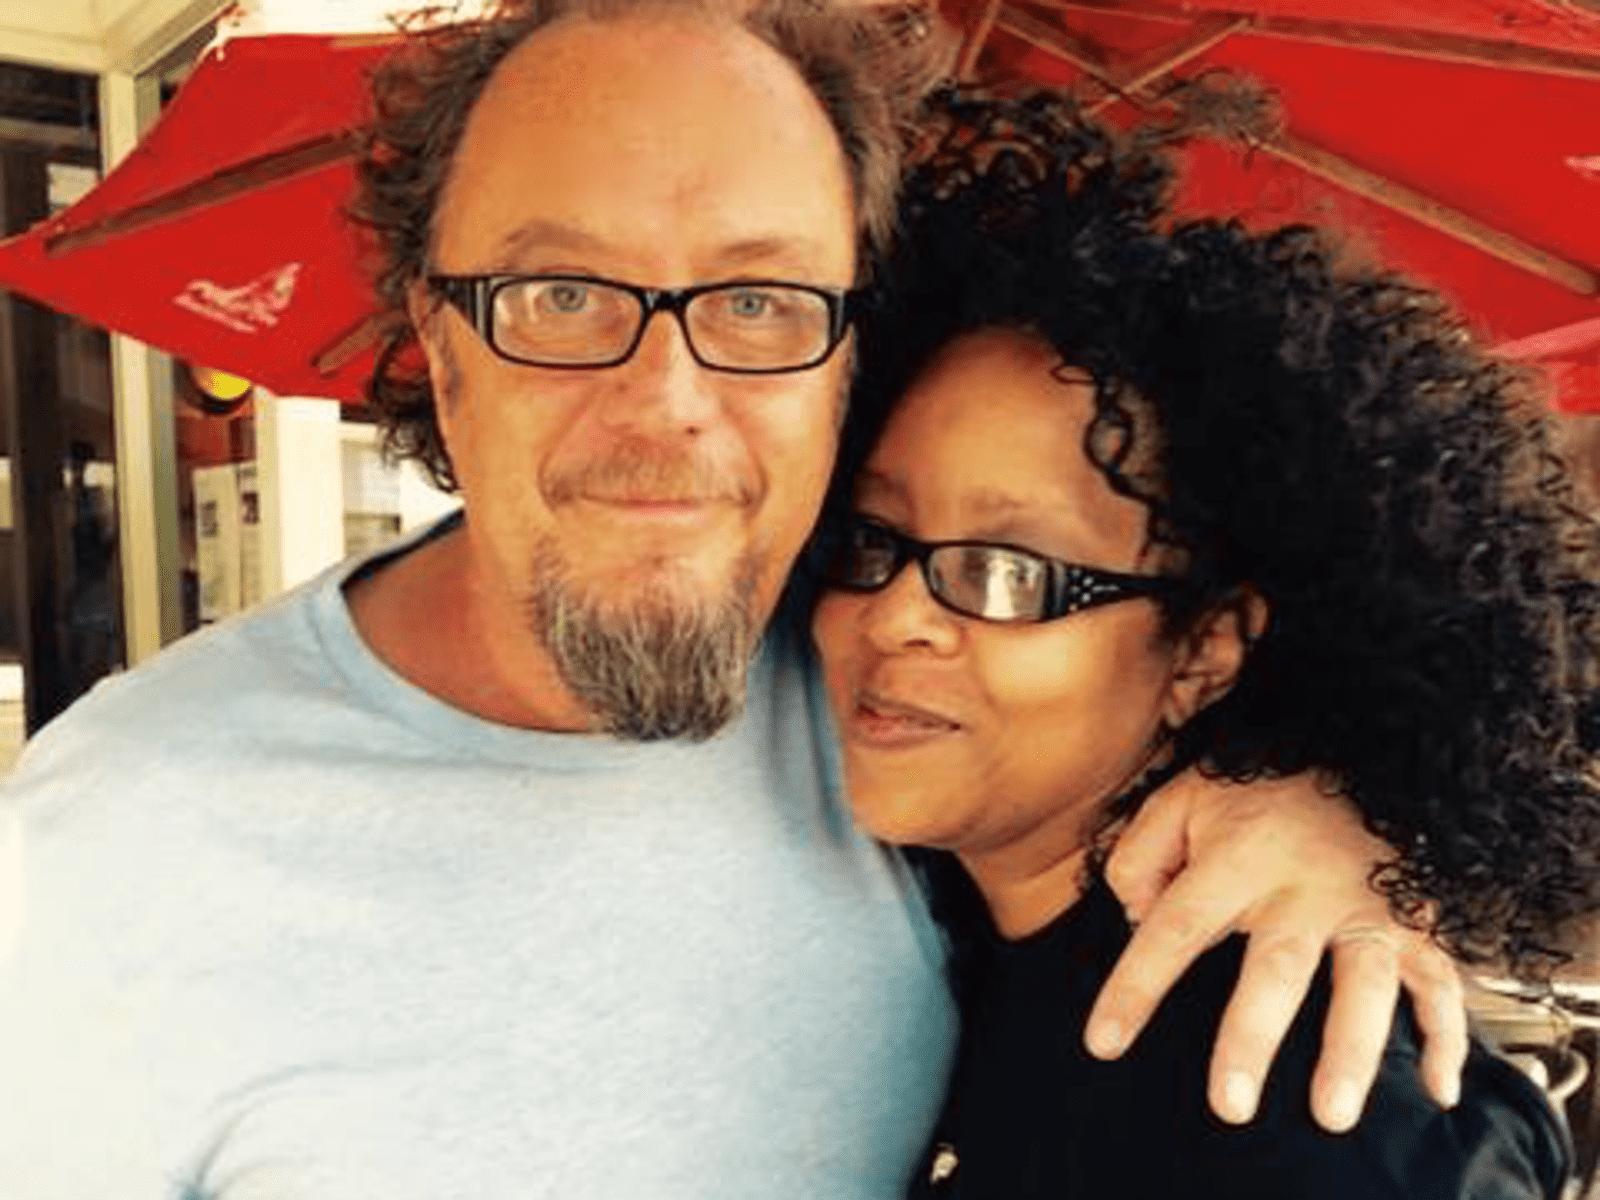 Pamela & Stephen from Los Angeles, California, United States